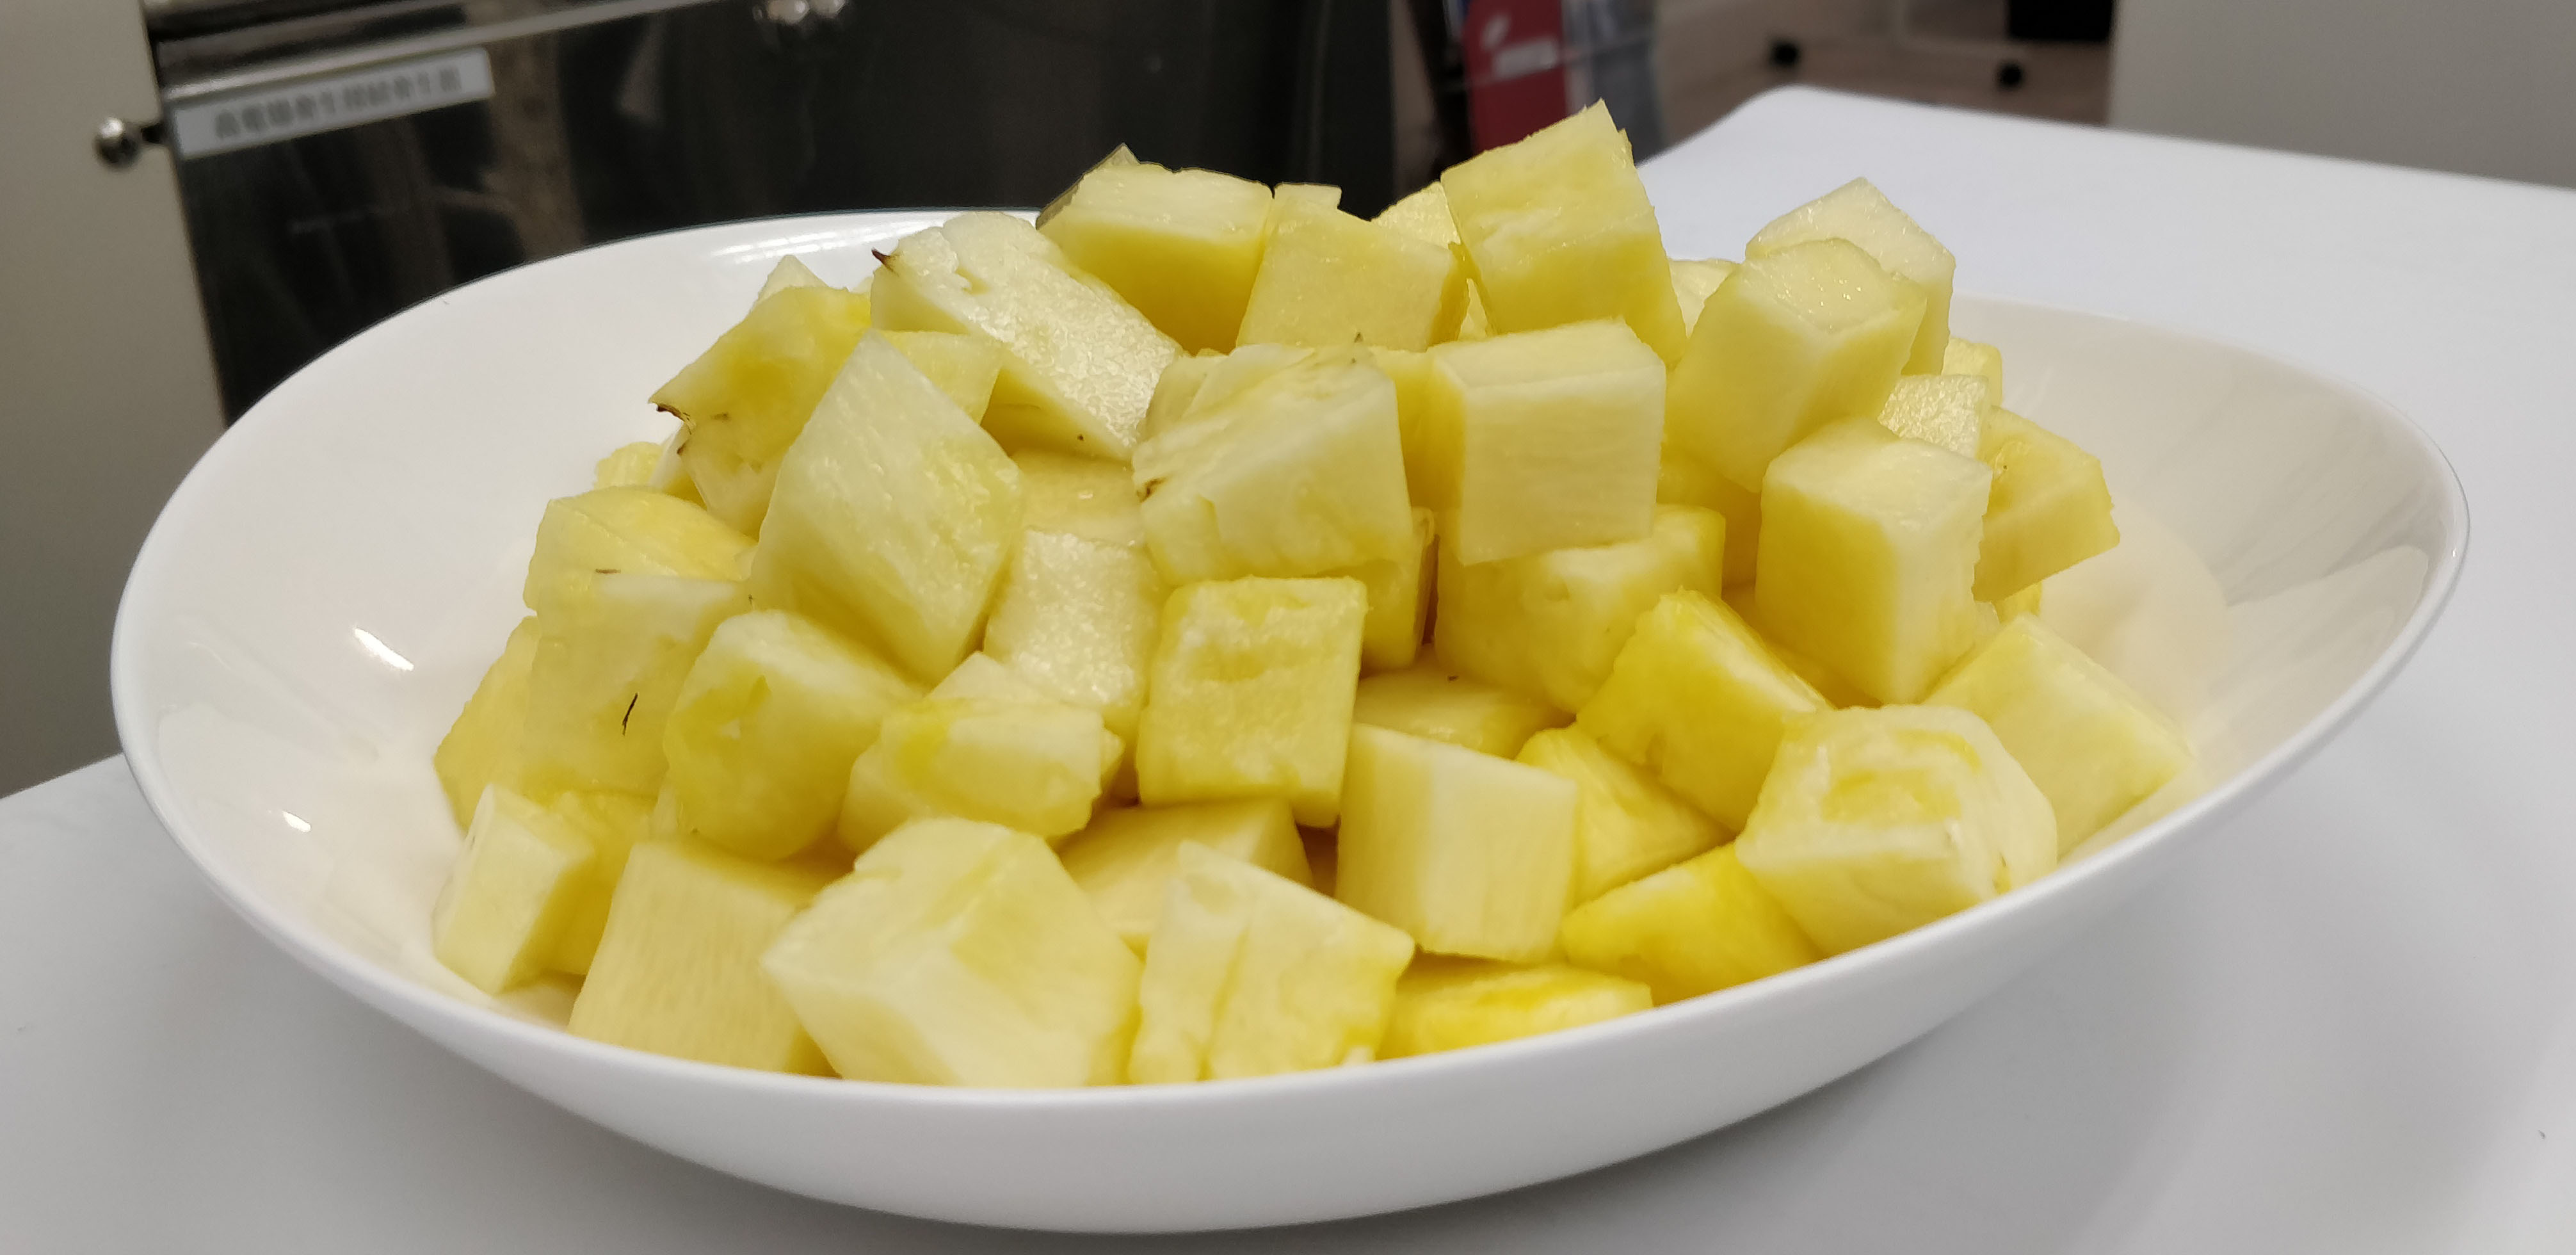 Prior to freezing pineapple